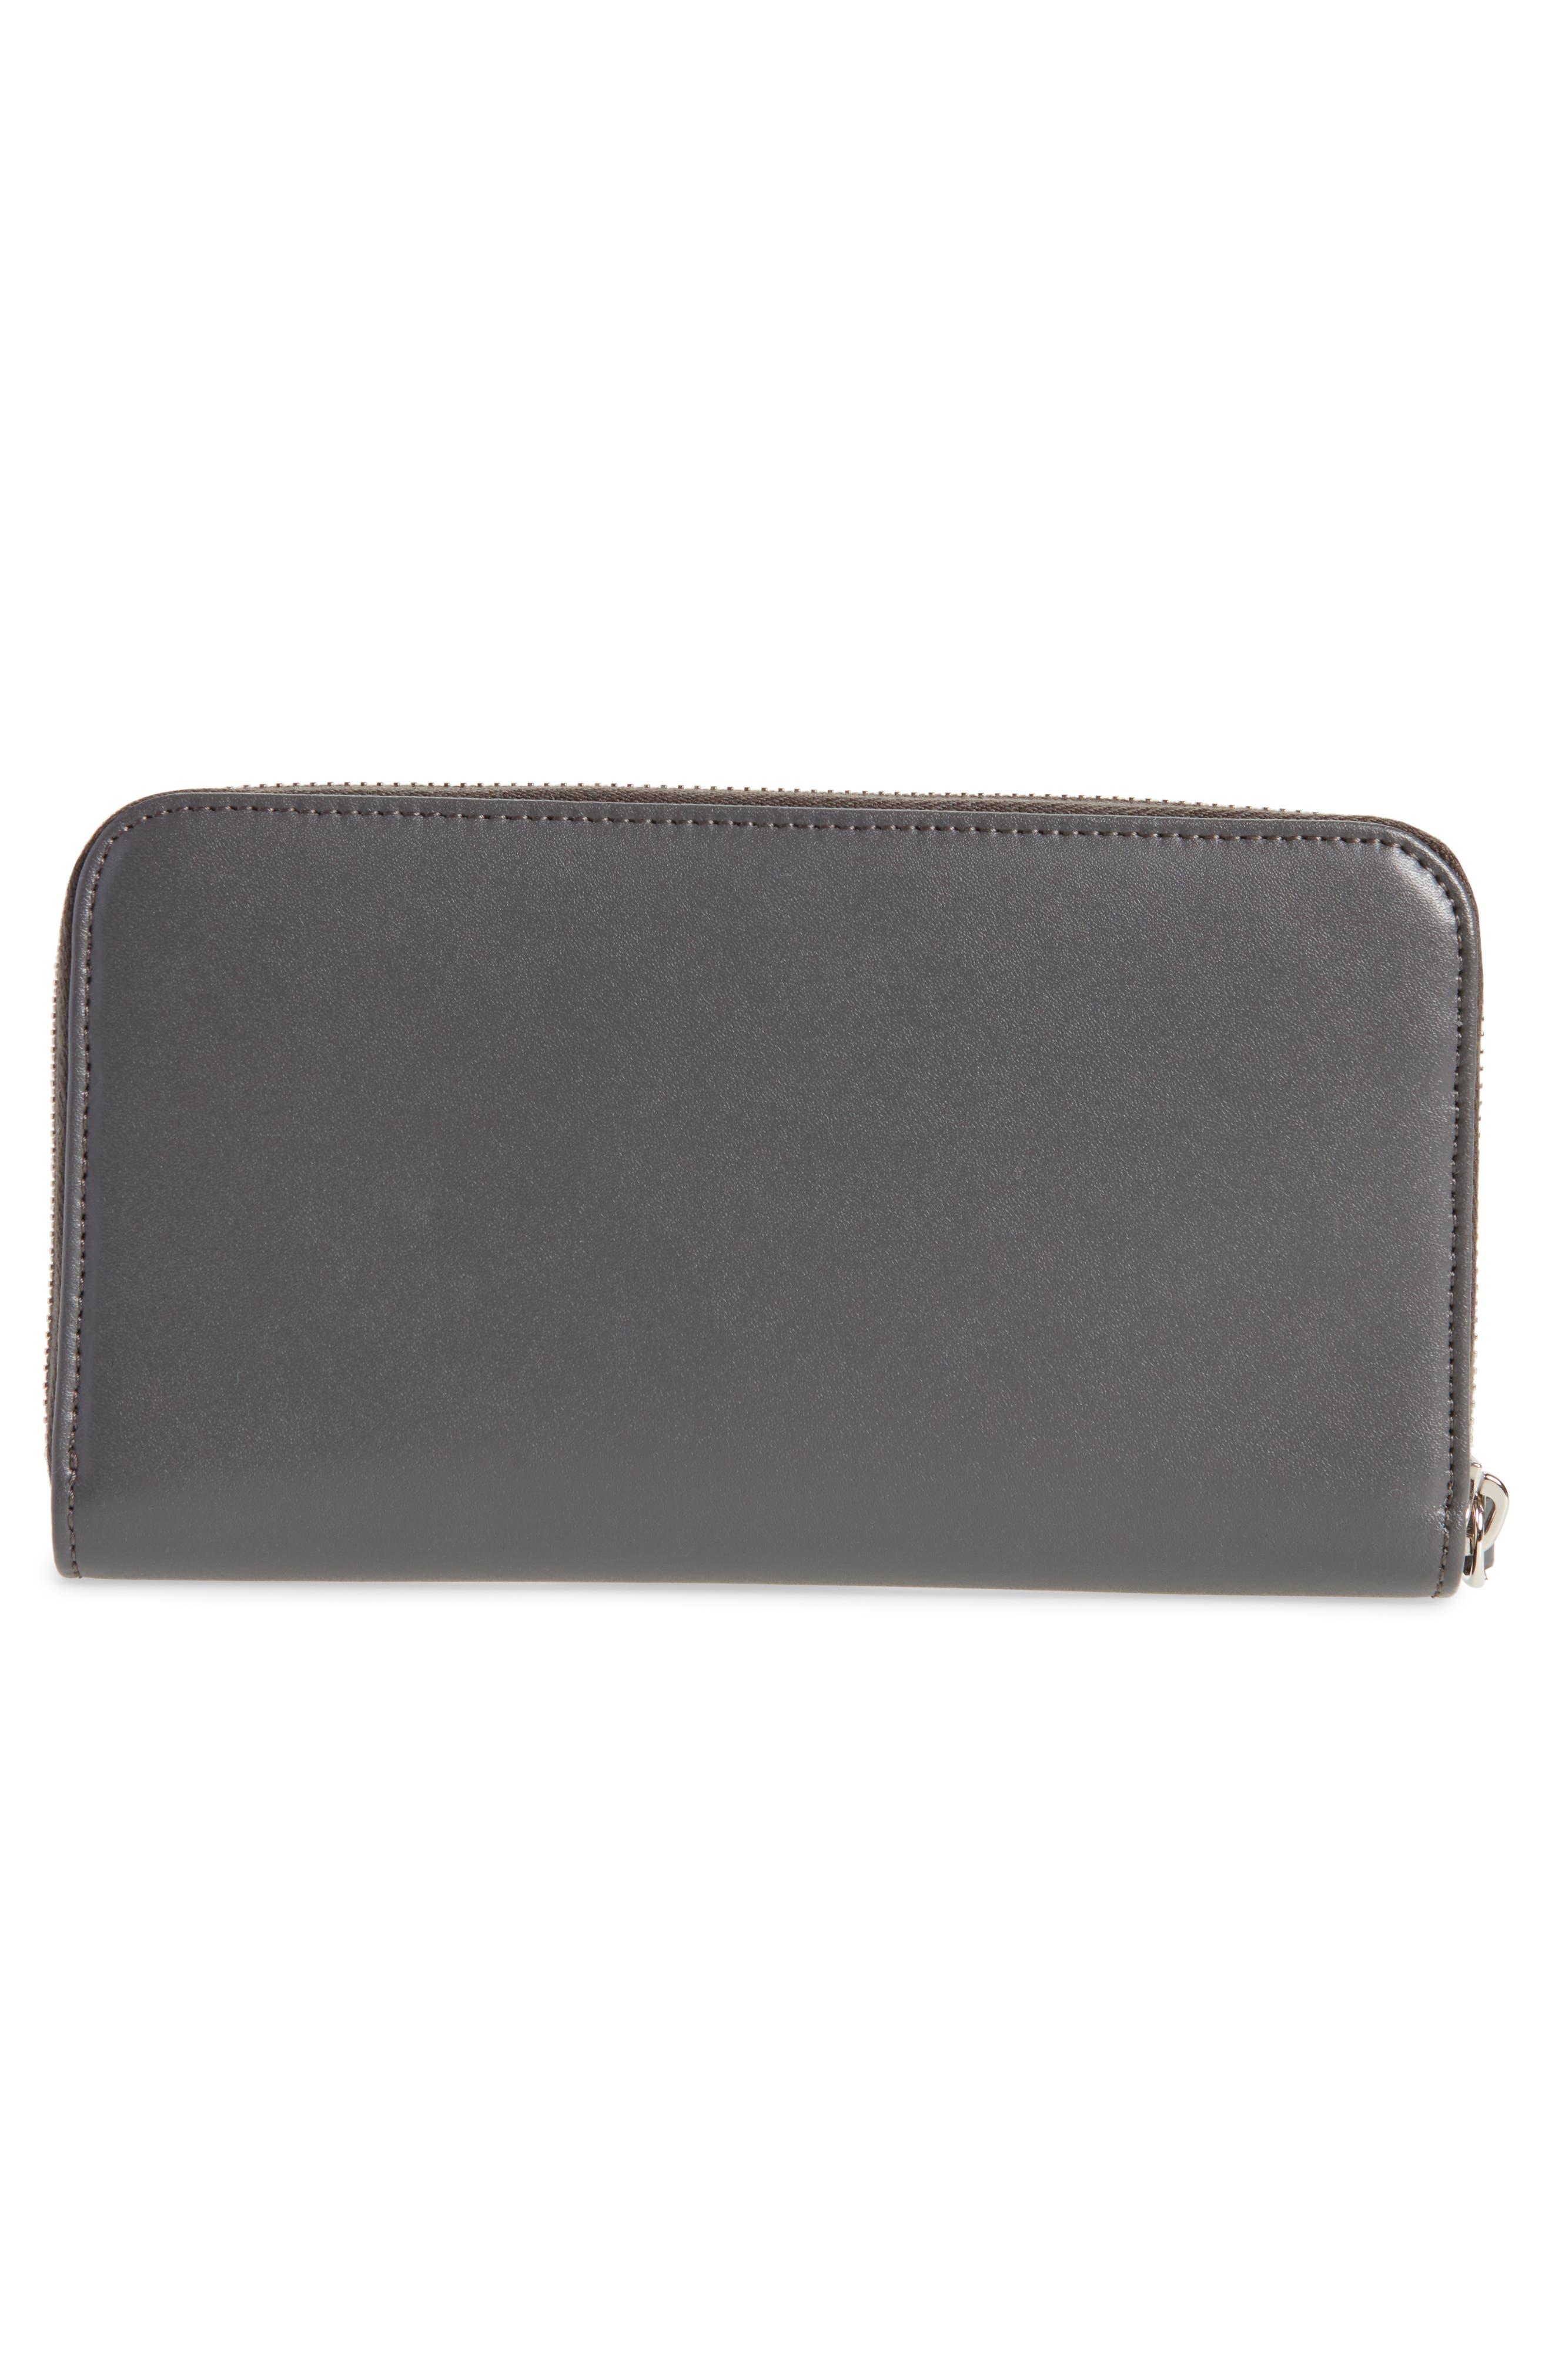 Studded Calfskin Wallet,                             Alternate thumbnail 4, color,                             Asphalt